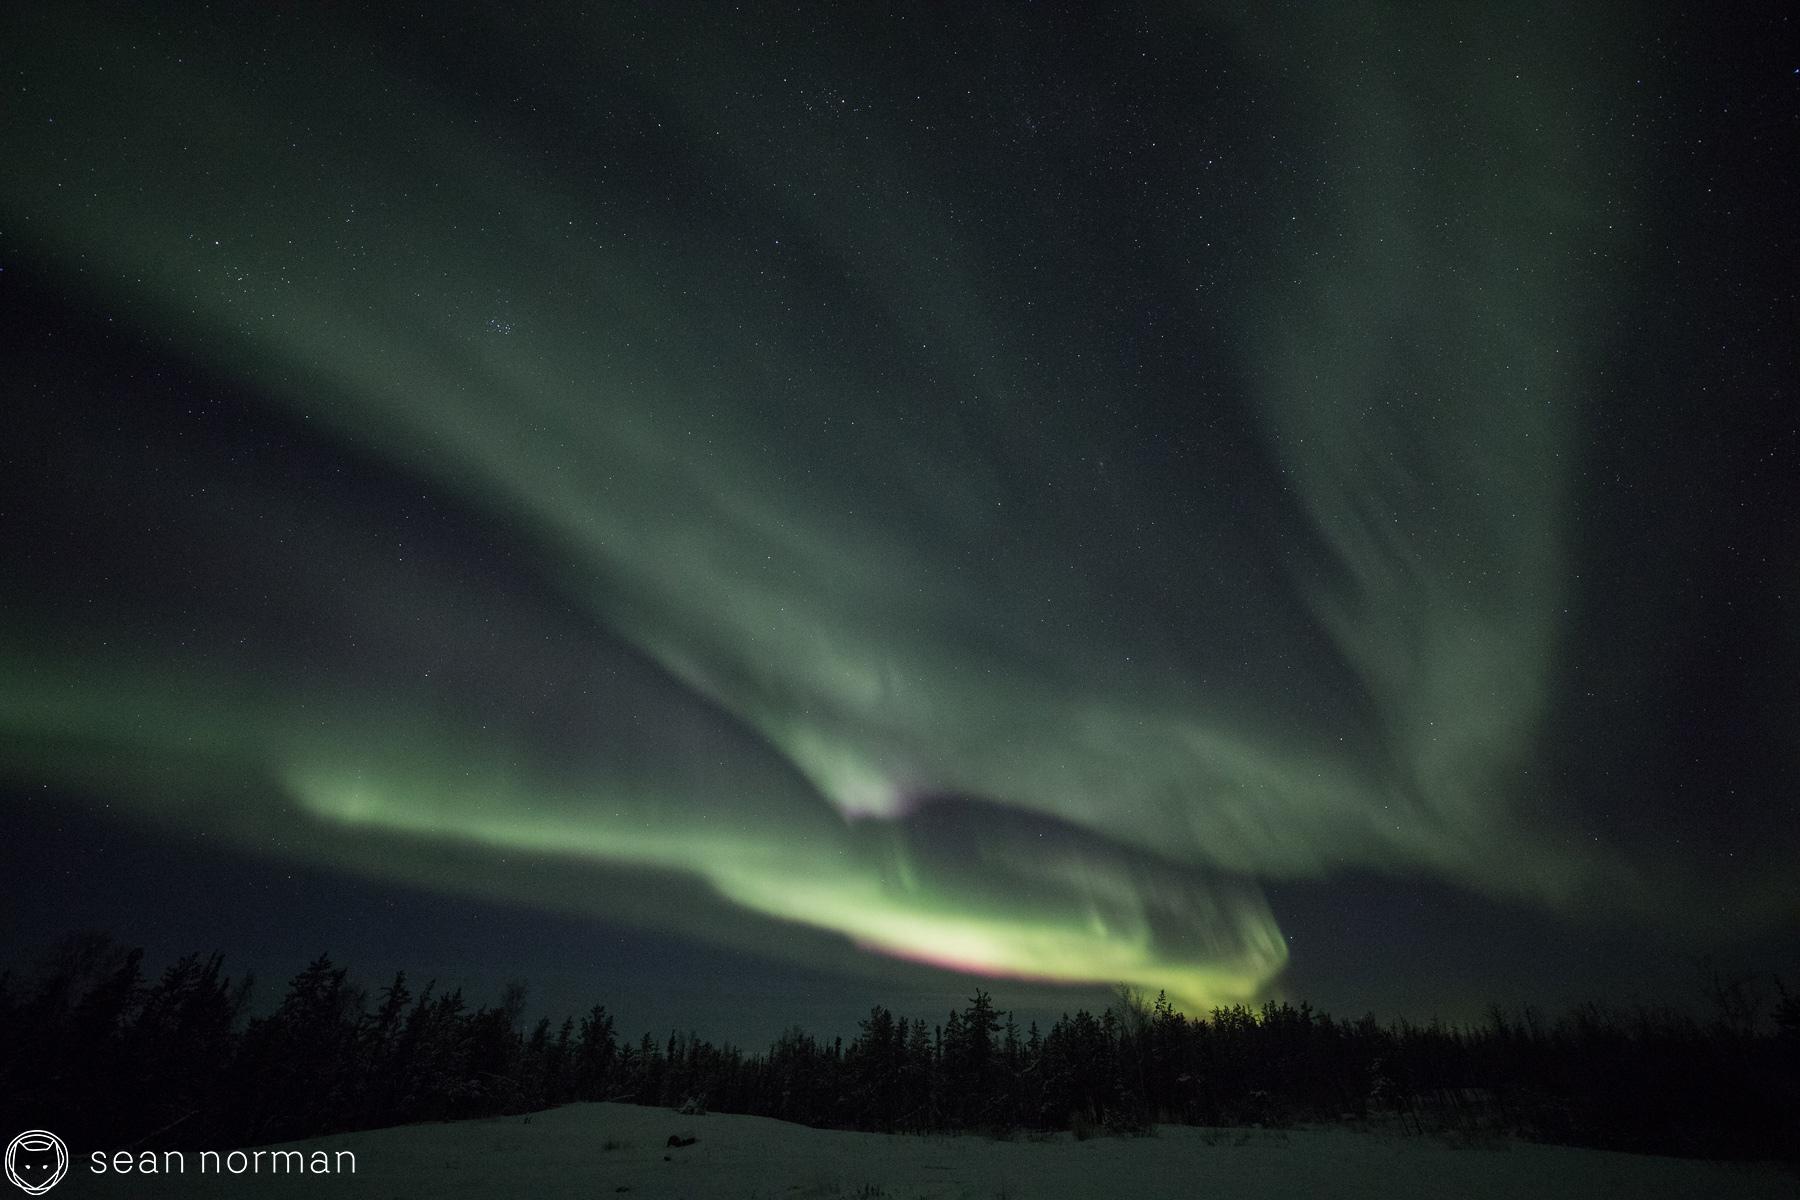 Yellowknife Northern Lights Photo Blog - Sean Norman Canada - 2.jpg